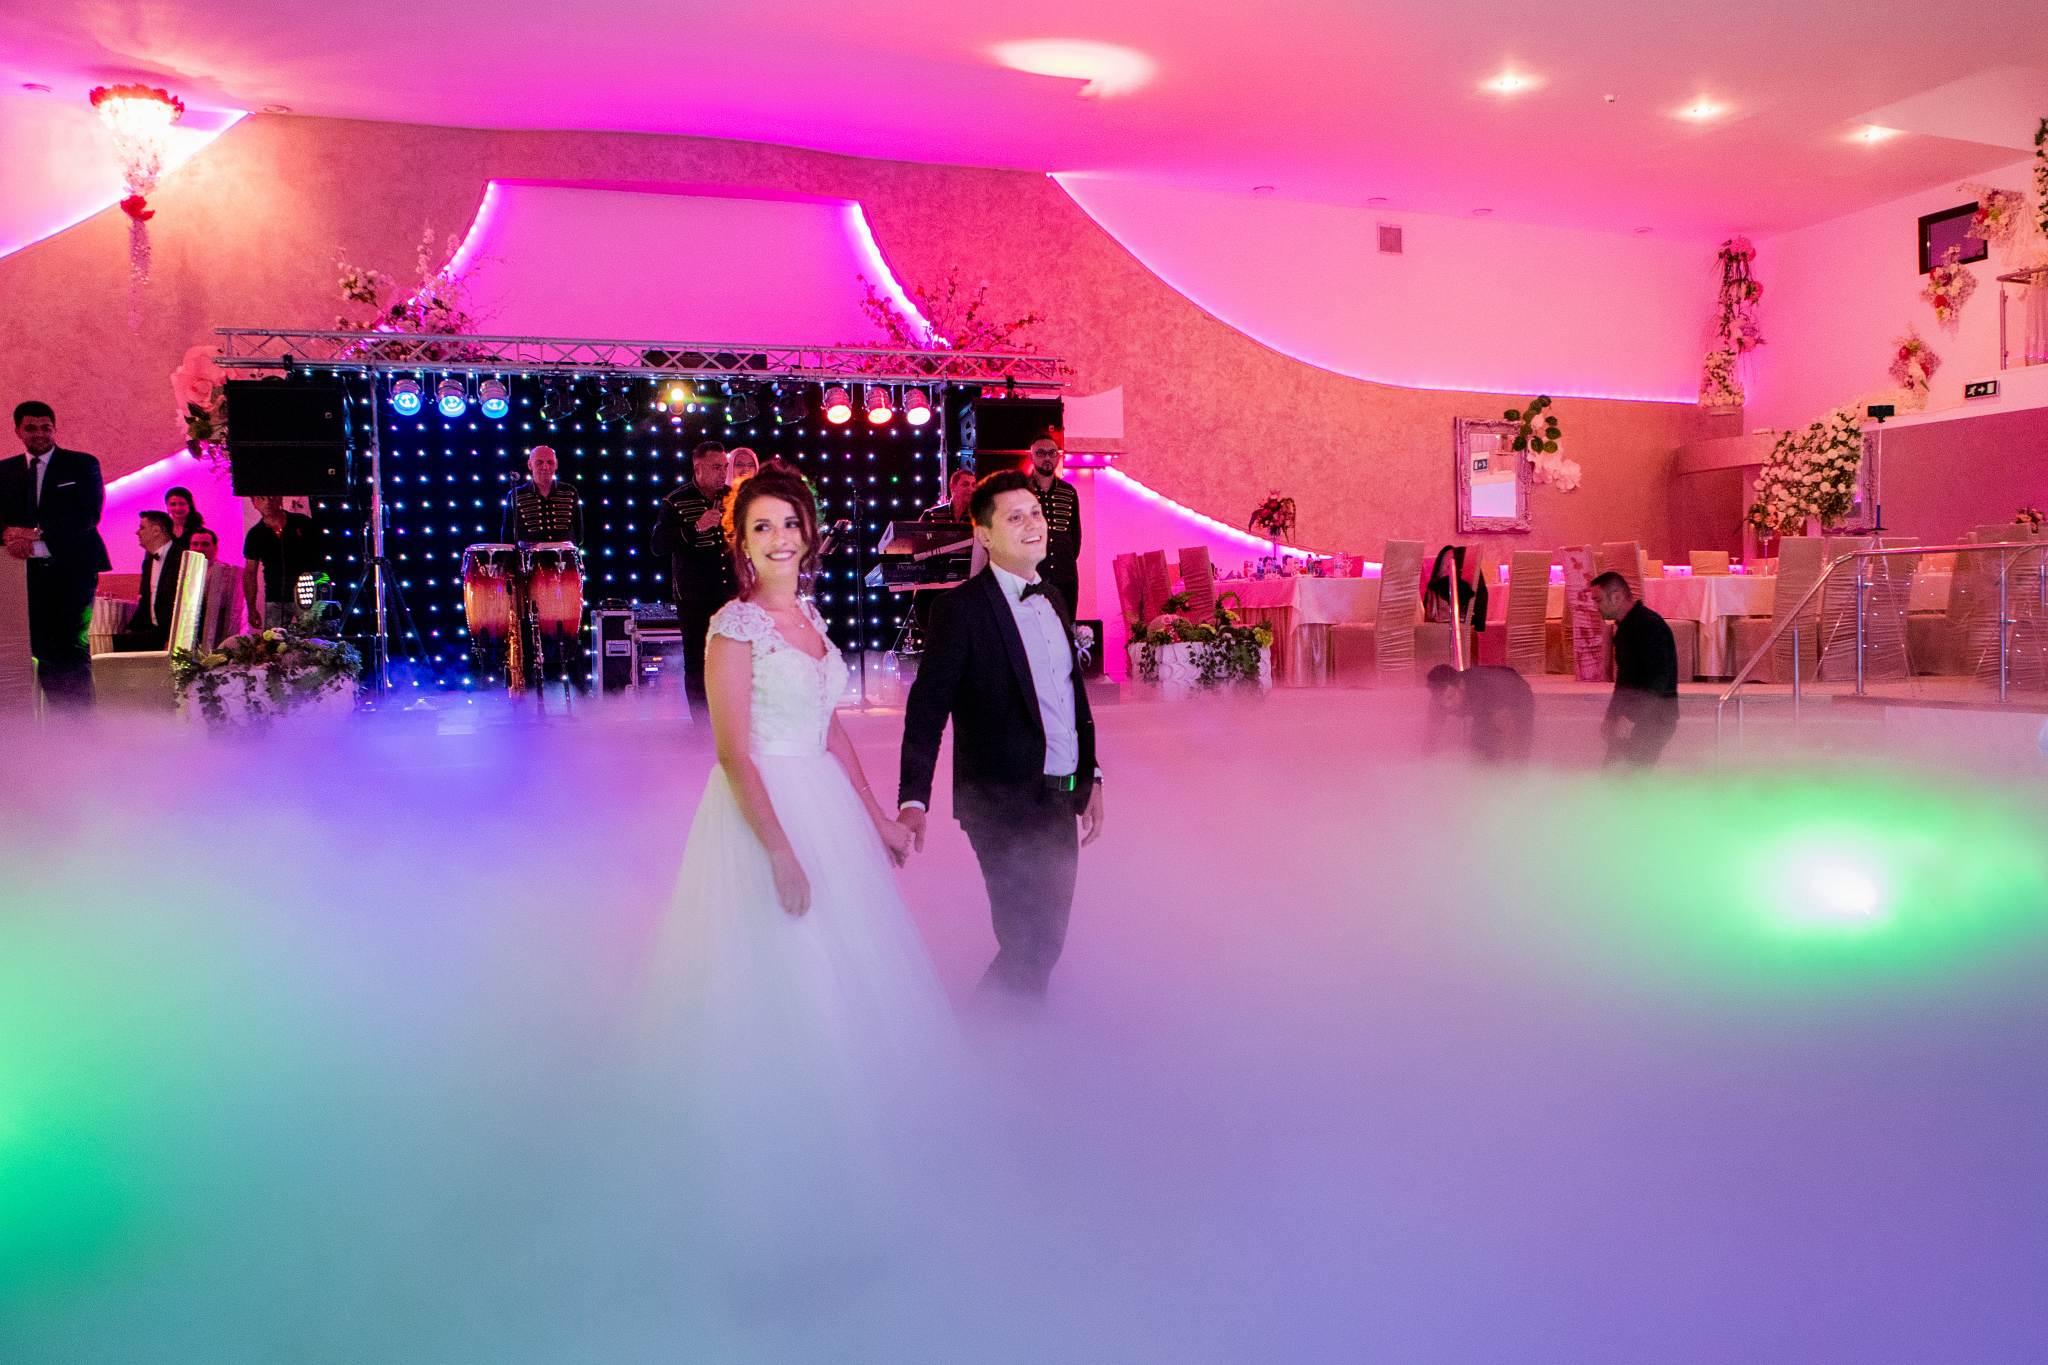 fotografii-nunta-cristina-si-sorin63.jpg